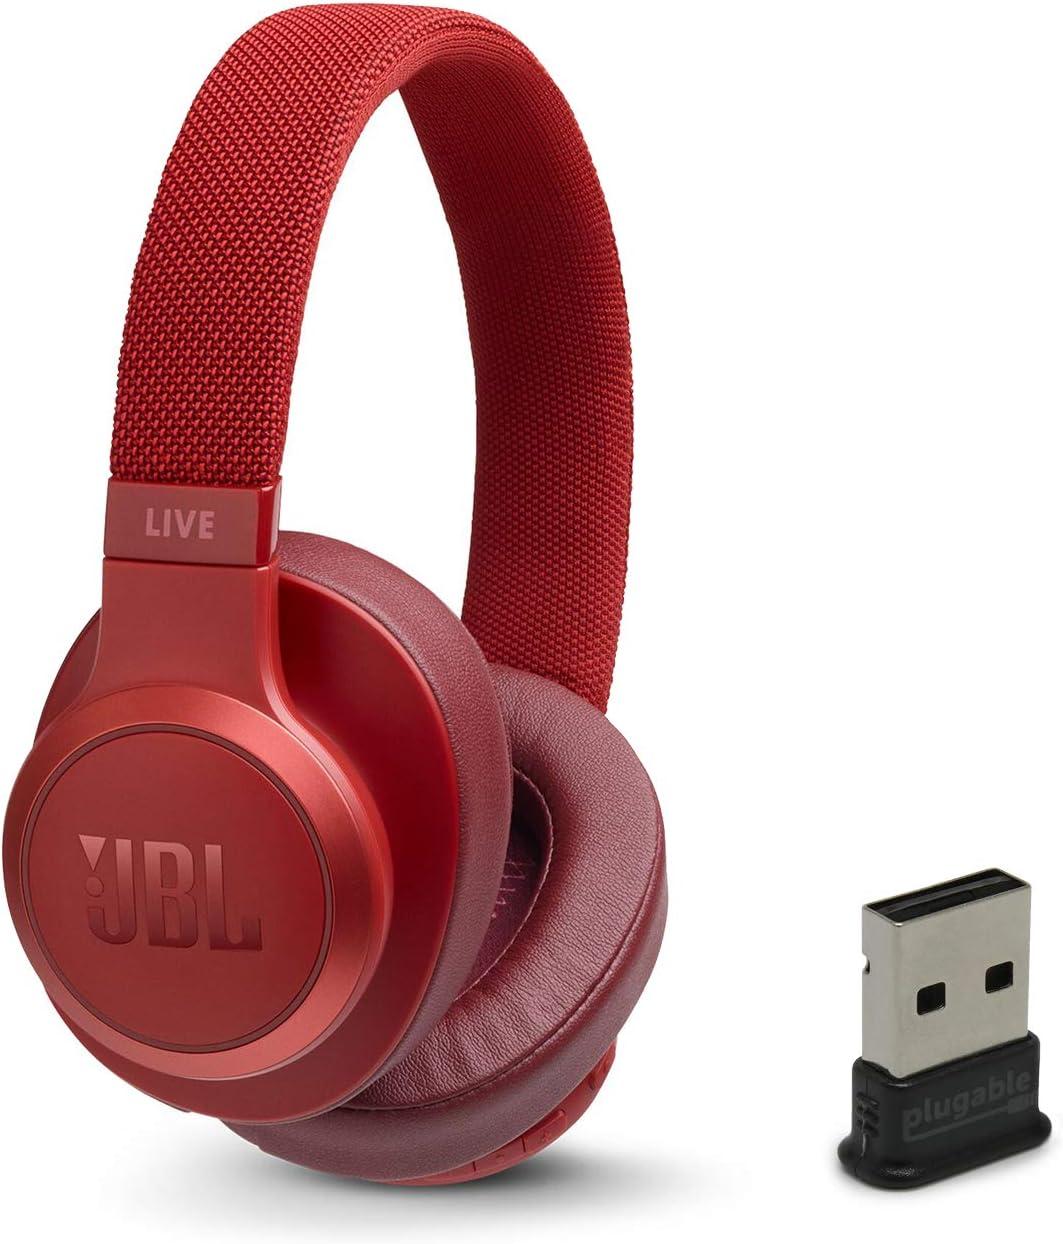 JBL Live 500BT Wireless Bluetooth On-Ear Headphones Bundle with Plugable USB-BT4LE USB 2.0 Bluetooth Adapter - Red